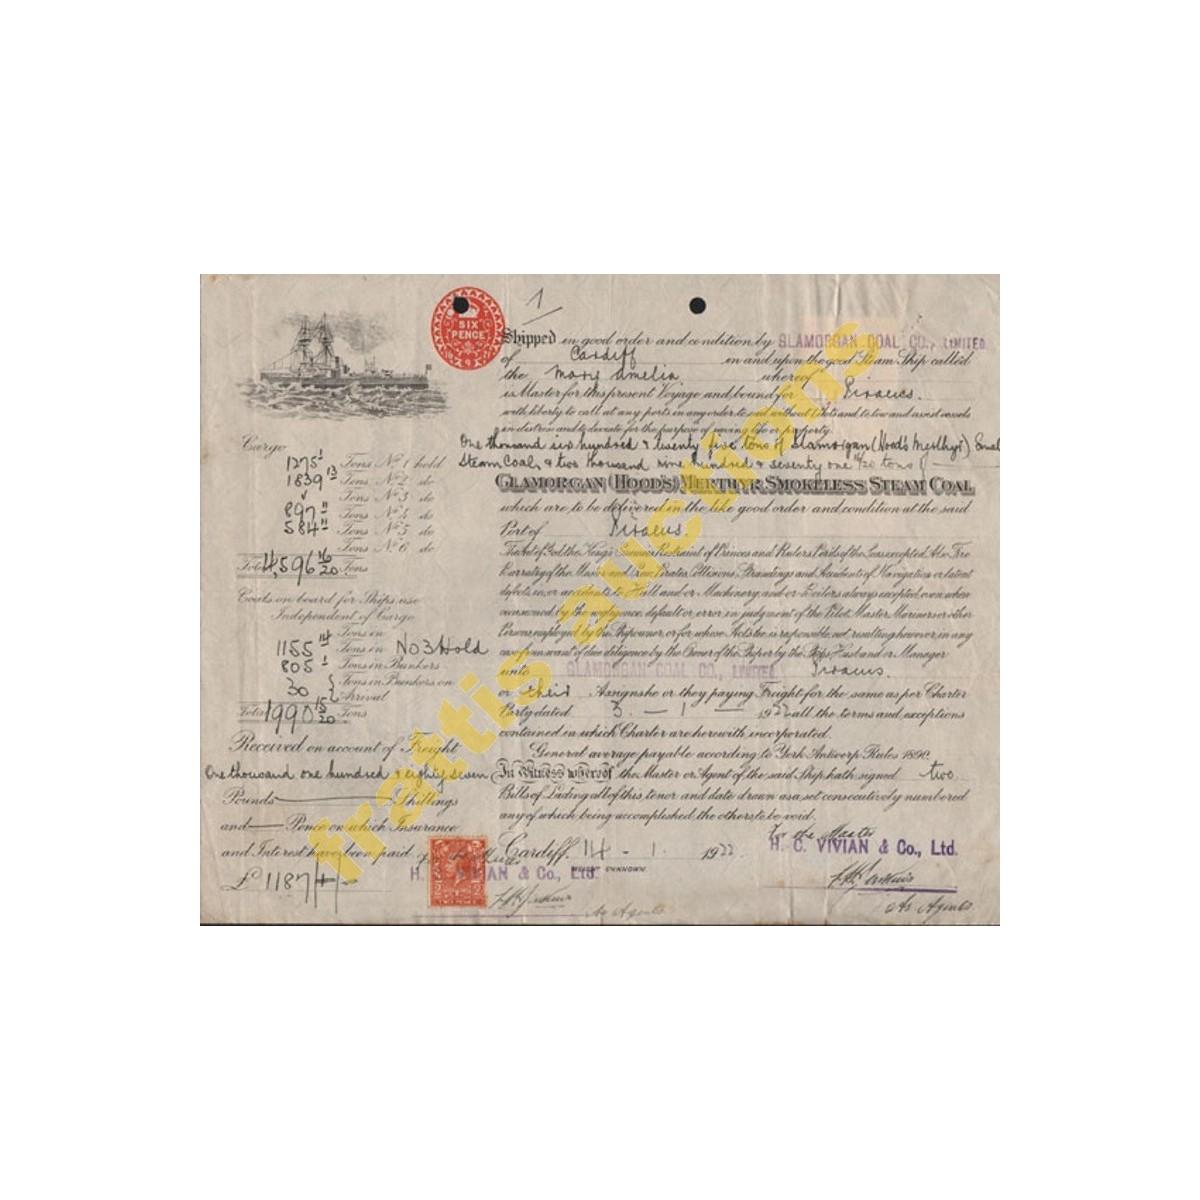 The Glamorgan Coal Company, Limited. Έγγραφο φόρτωσις 1922.